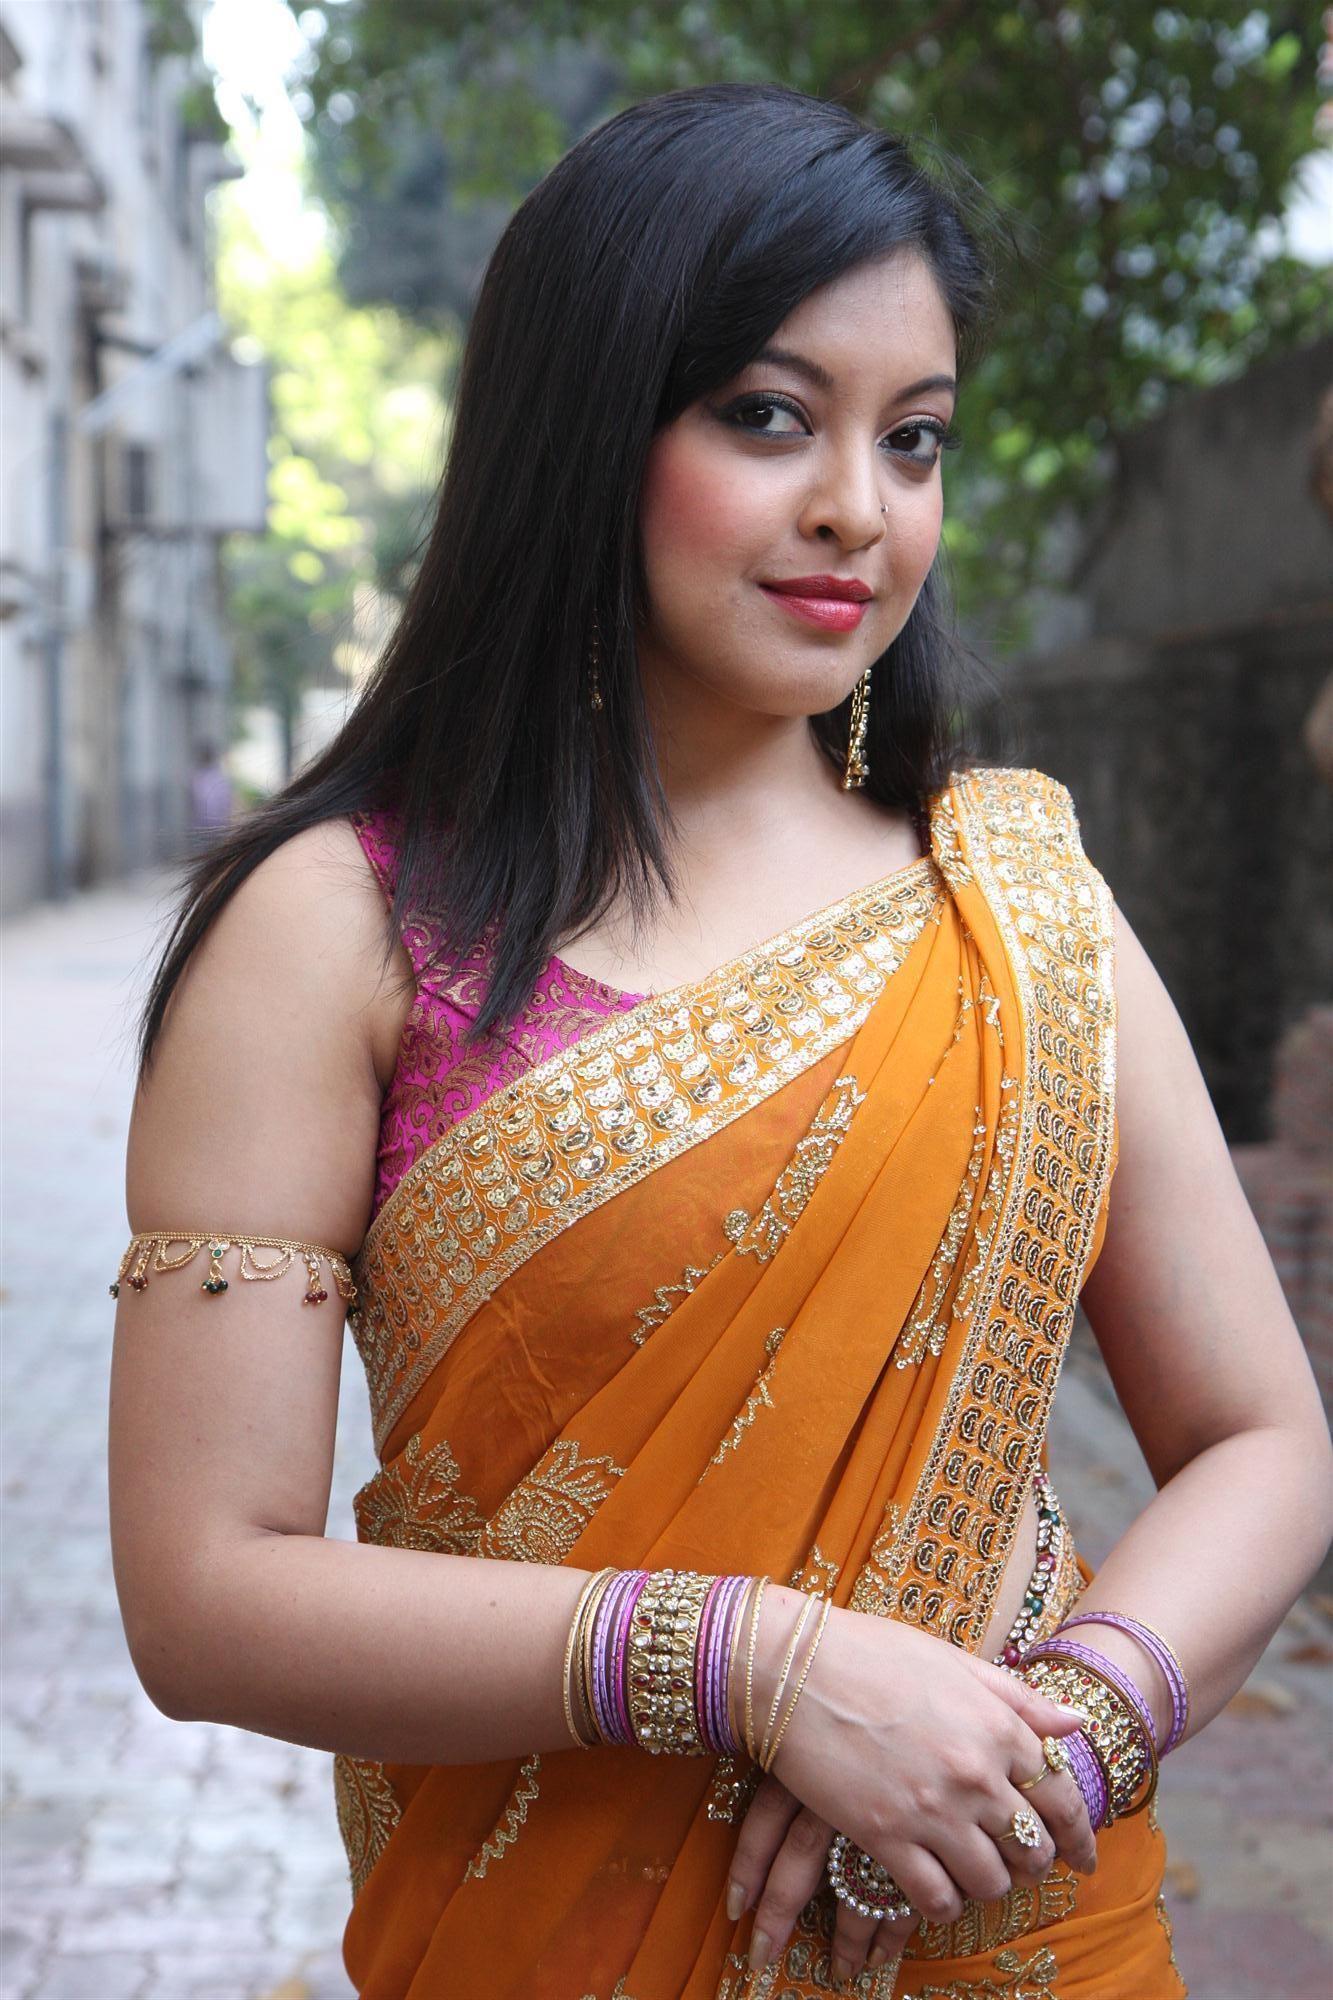 tanushree dutta sister